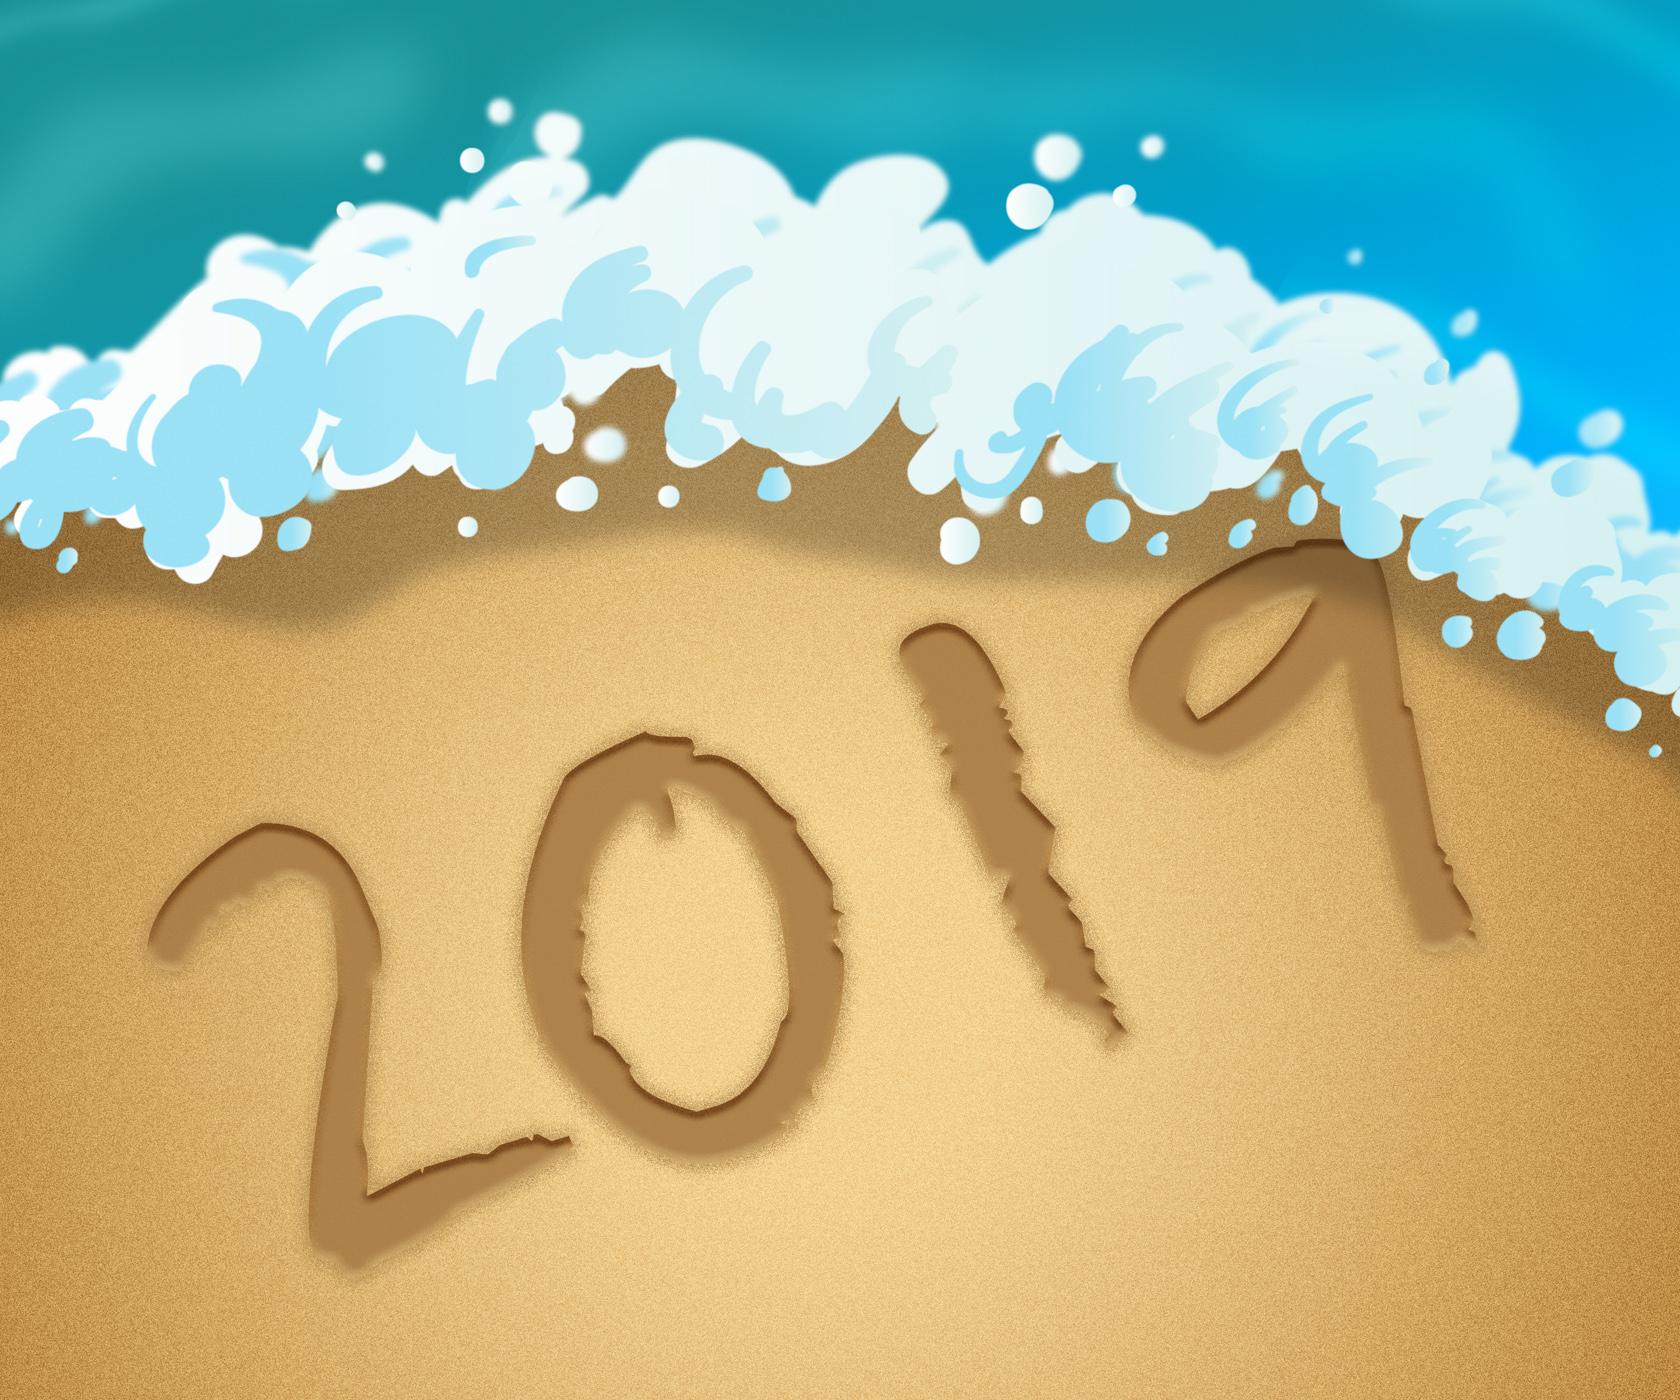 Twenty nineteen represents 2019 new year 3d illustration photo